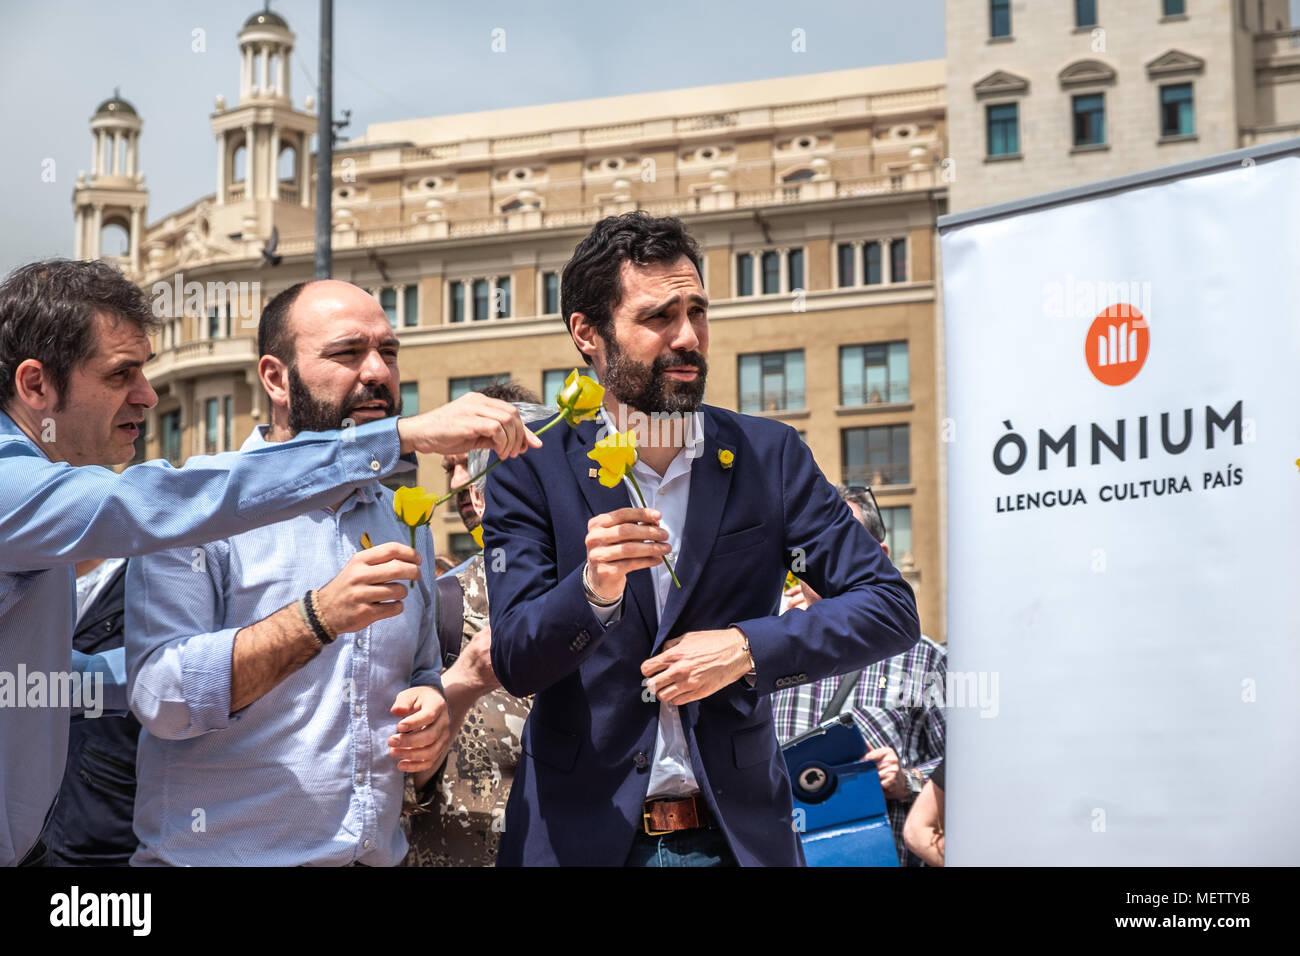 Mauri Spain Stockfotos & Mauri Spain Bilder - Alamy